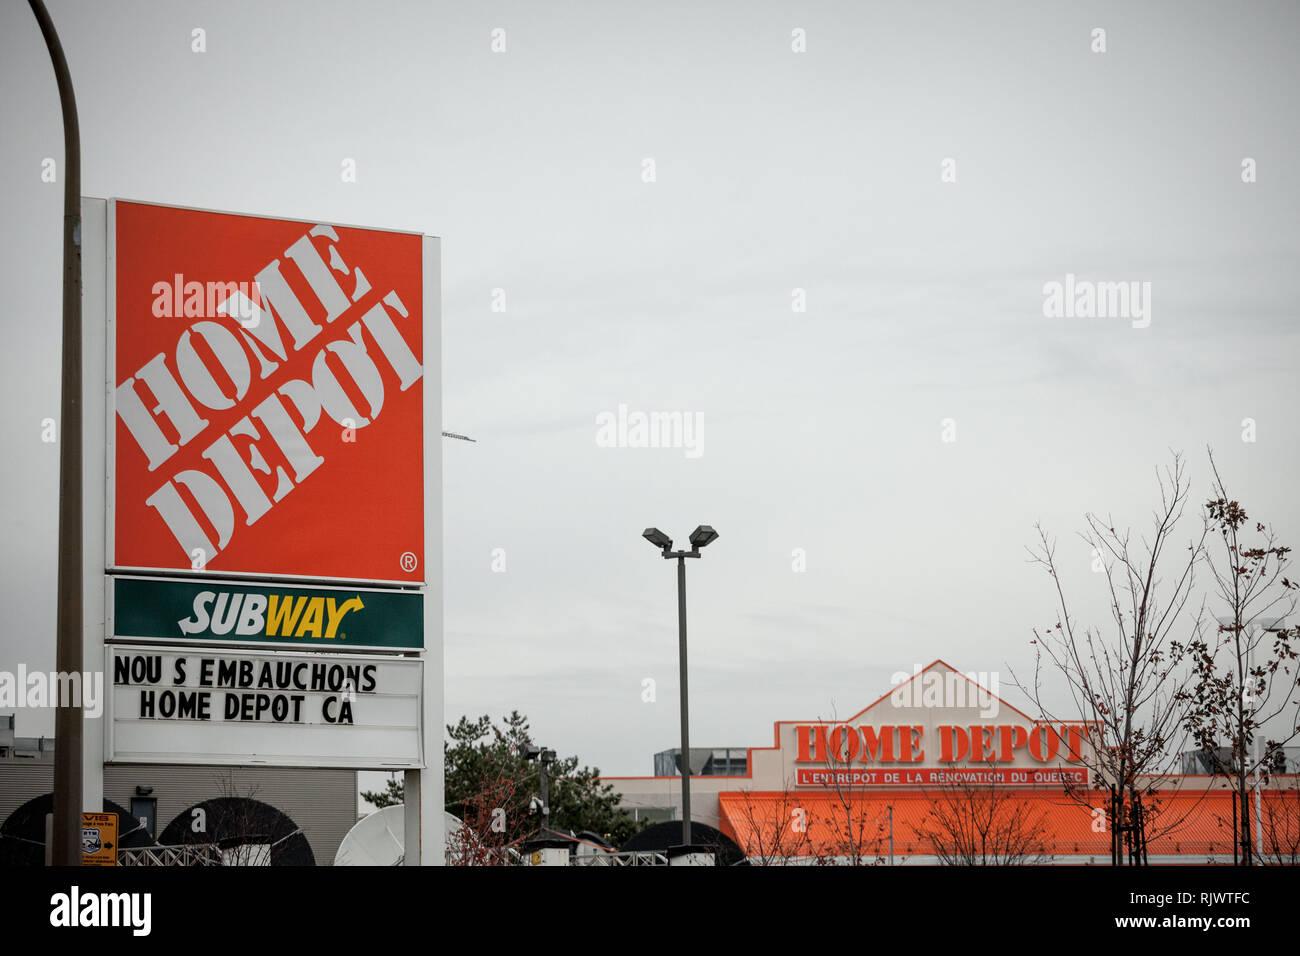 MONTREAL, CANADA - NOVEMBER 9, 2018: Home Depot logo in